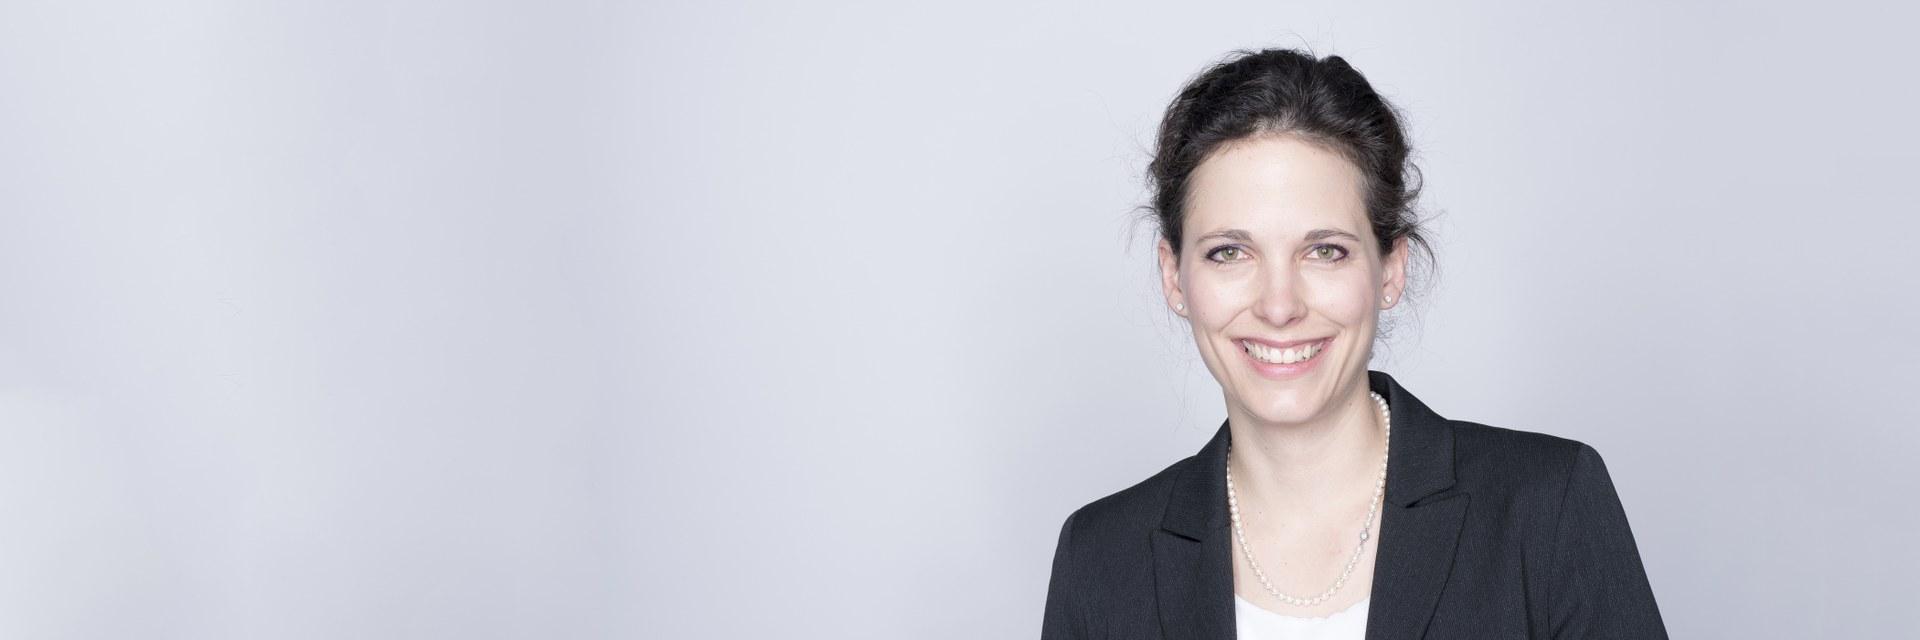 Dr. Sonja Neuhaus